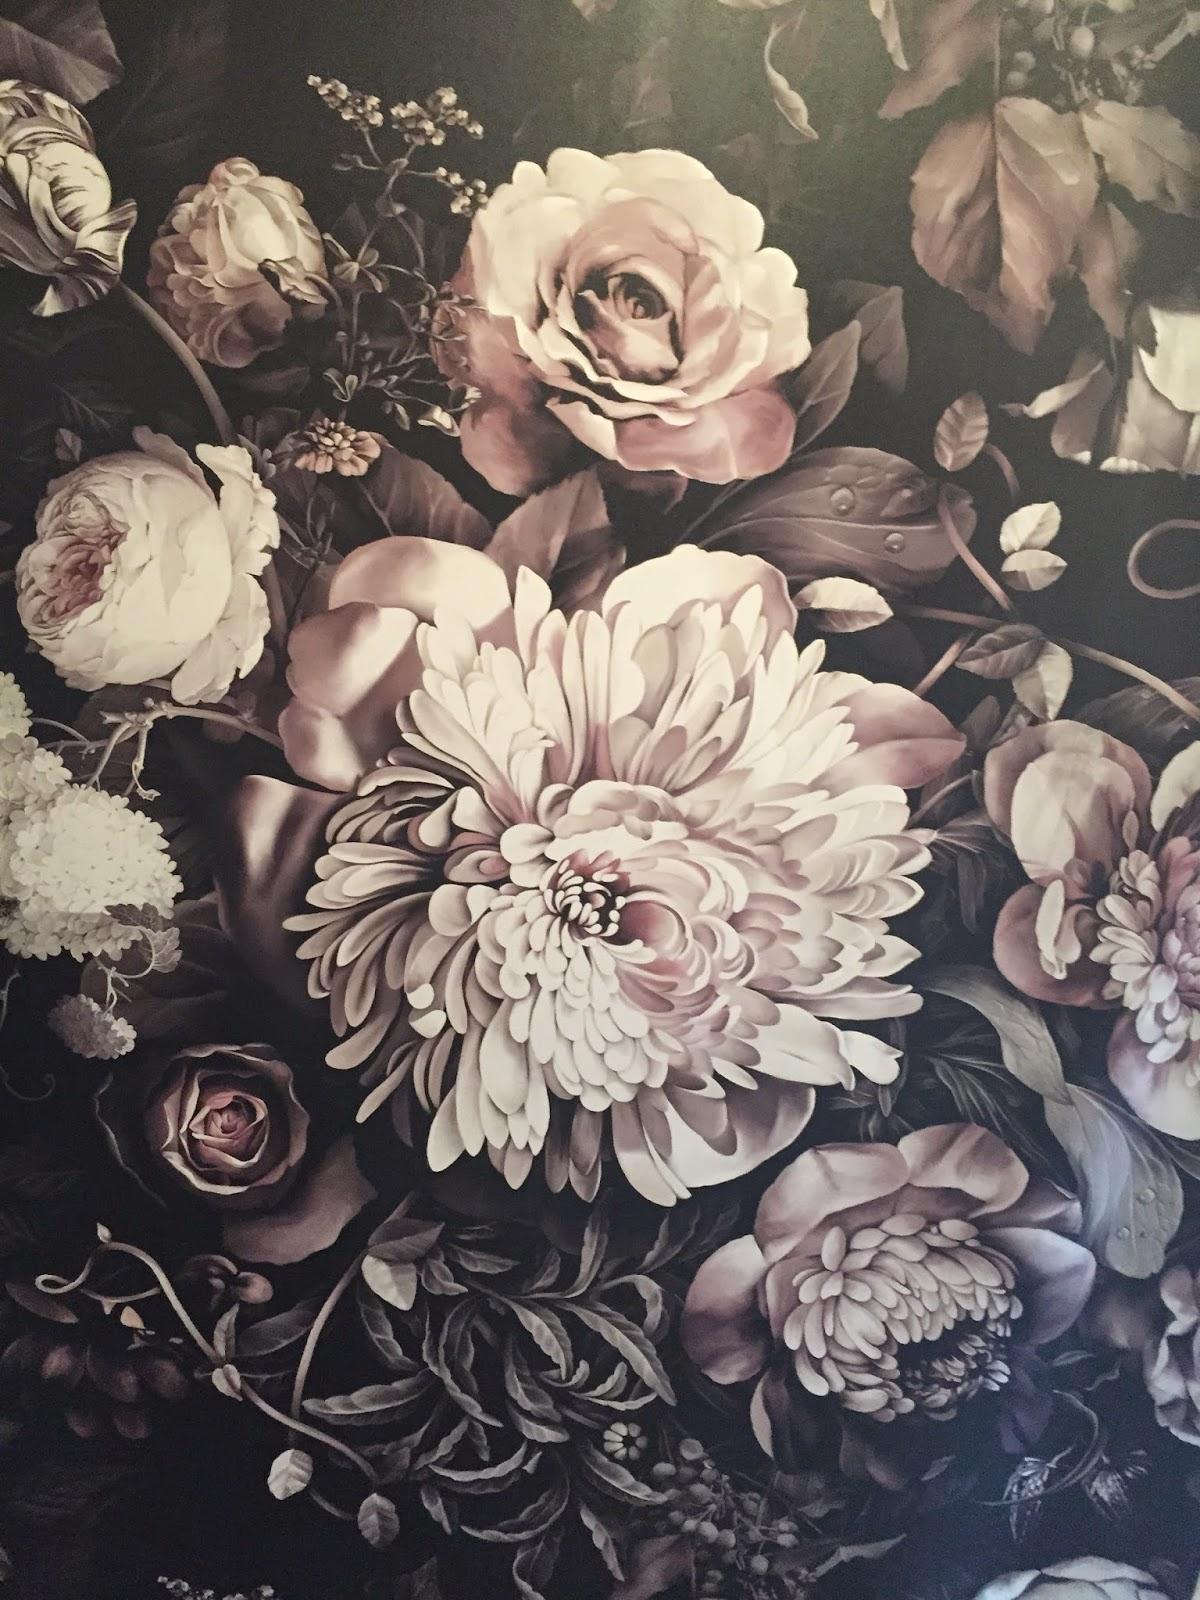 Black floral print wallpaper dark floral wallpaper by ellie cashman - The Dark Floral Wallpaper In The Dressing Rooms Is By Ellie Cashman